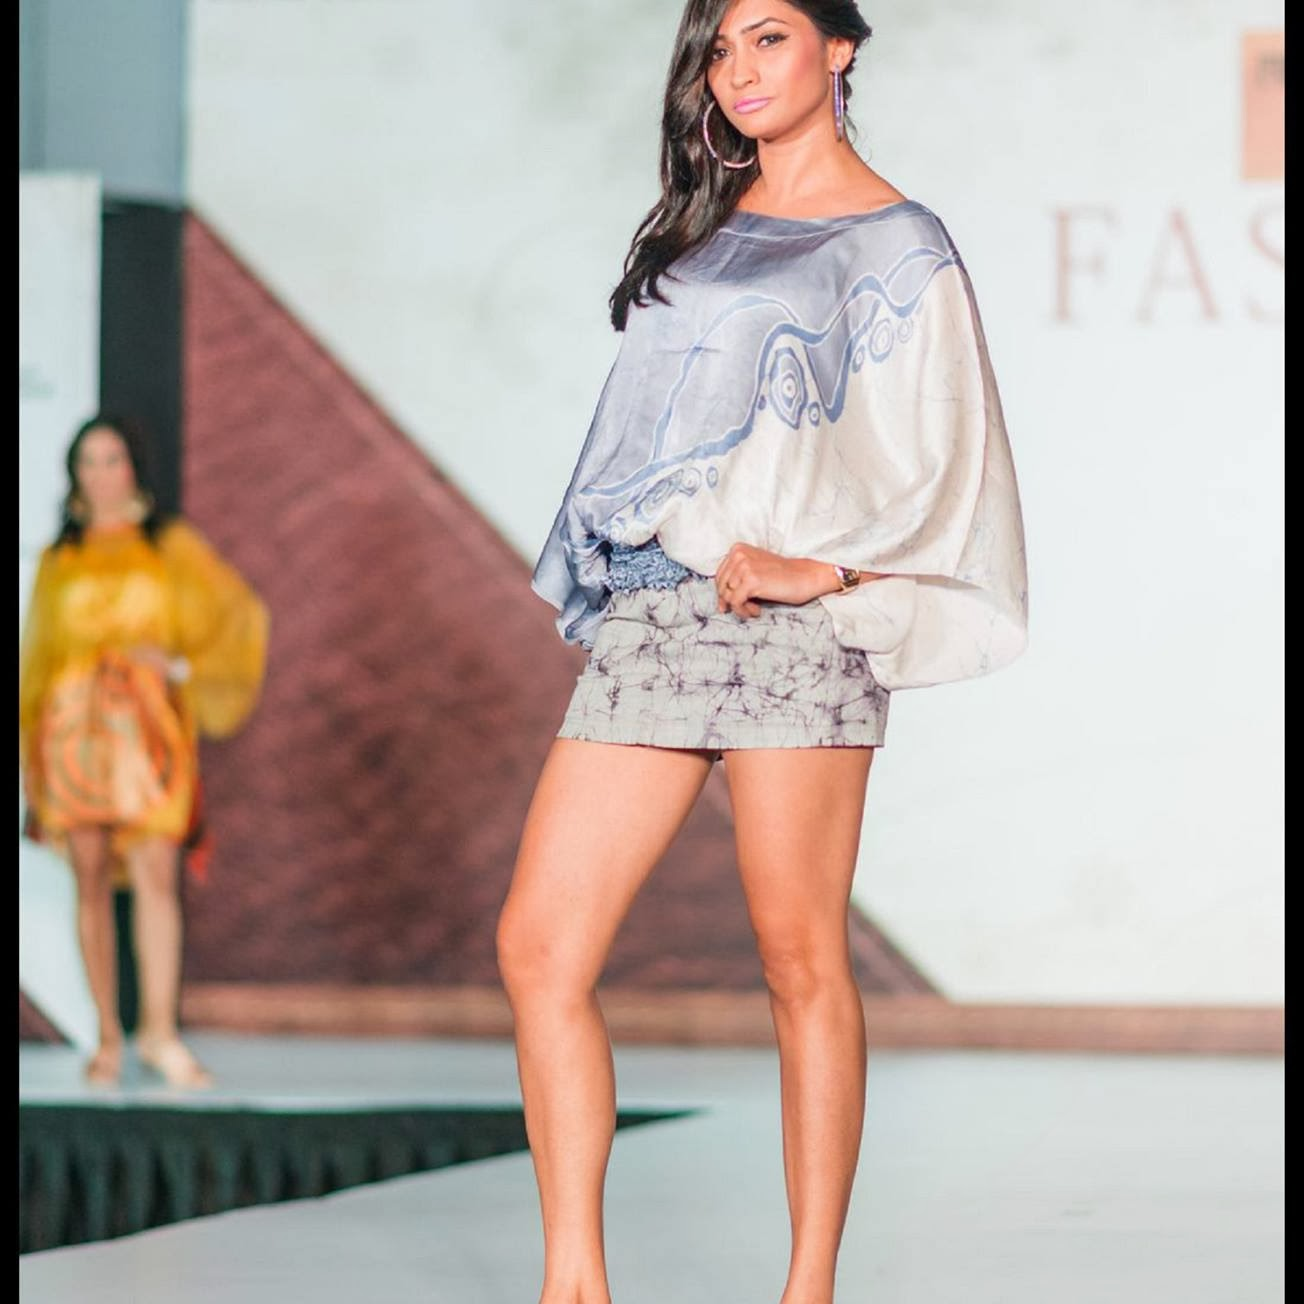 Tania Deen hot legs on ramp